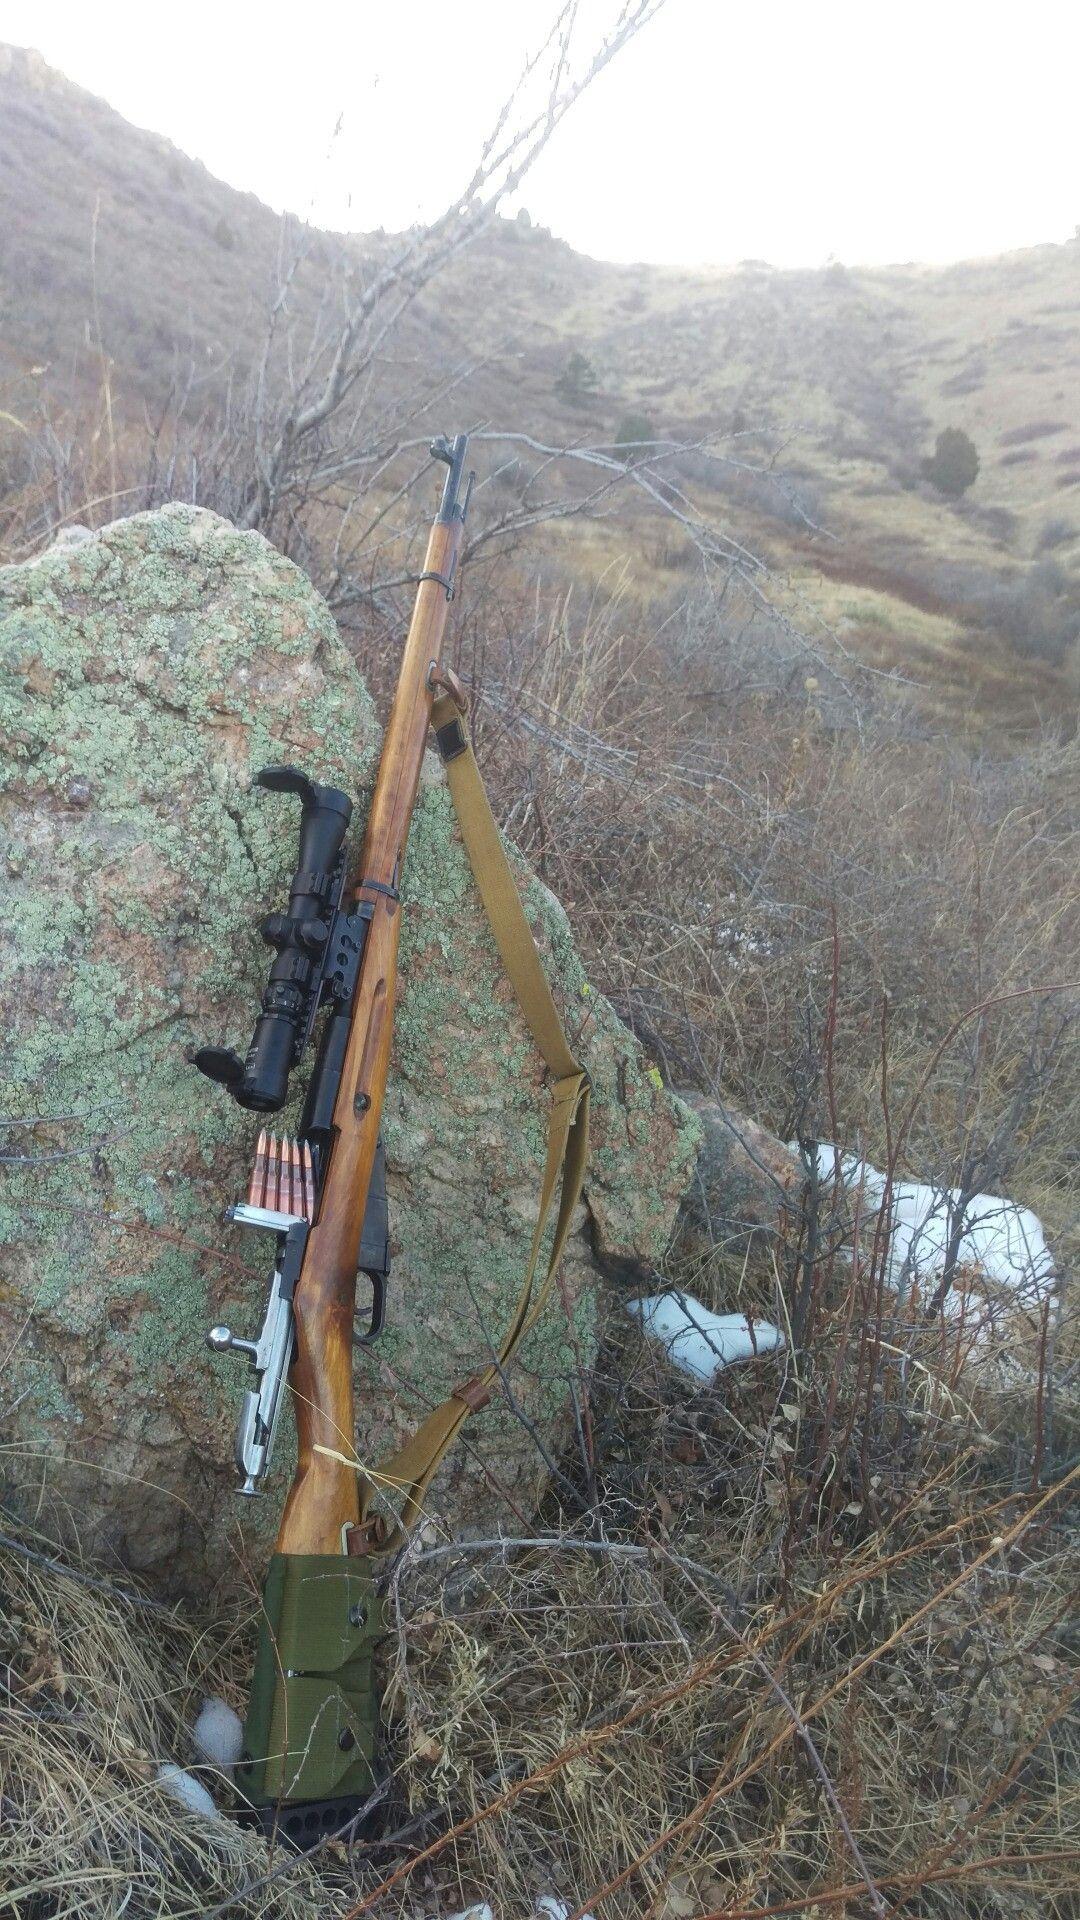 mosin nagant m91/30 Military guns